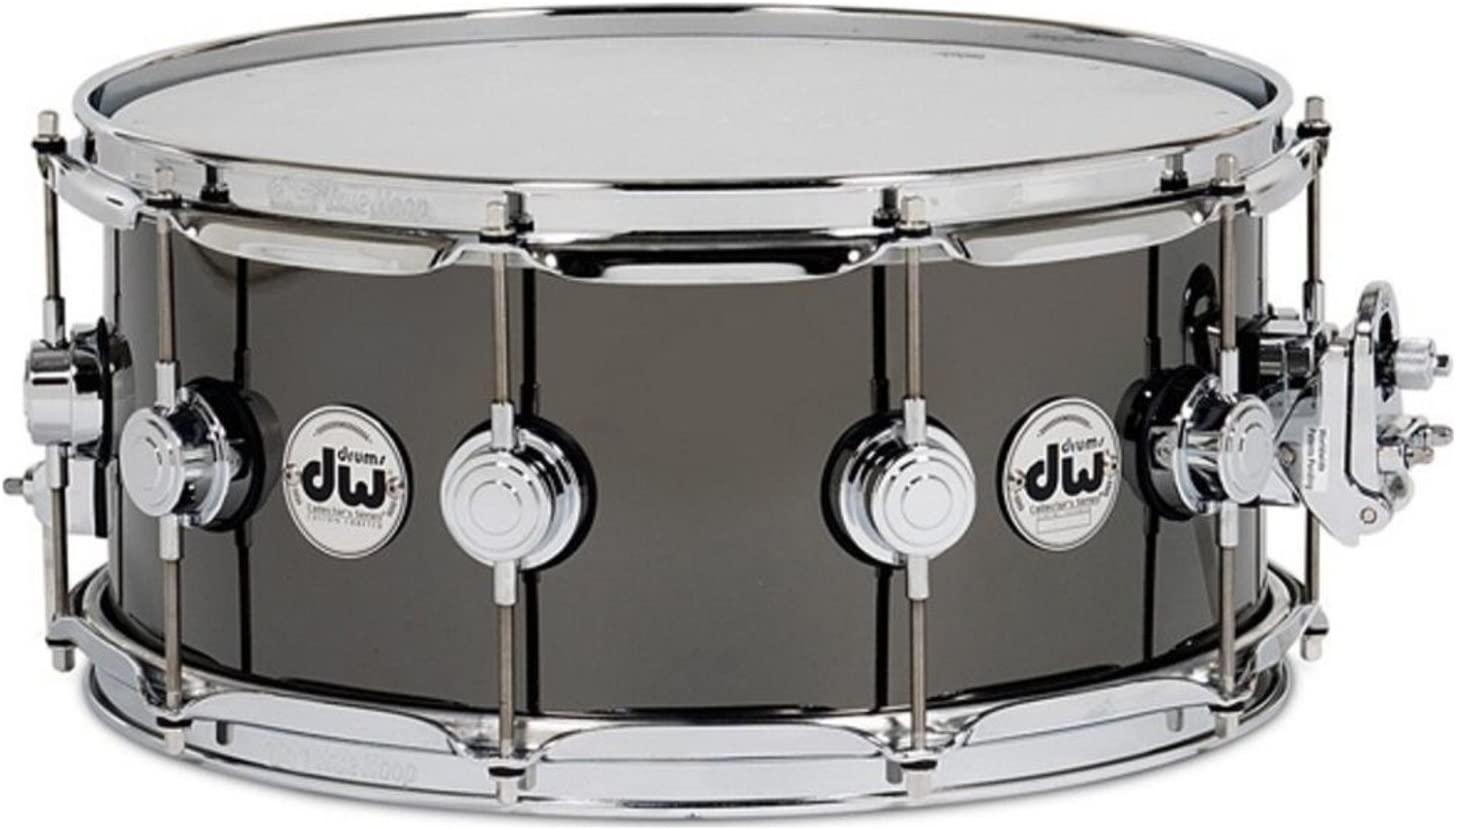 Drum Workshop Collector's Series Black Nickel over Brass Snare Drum - 5.5